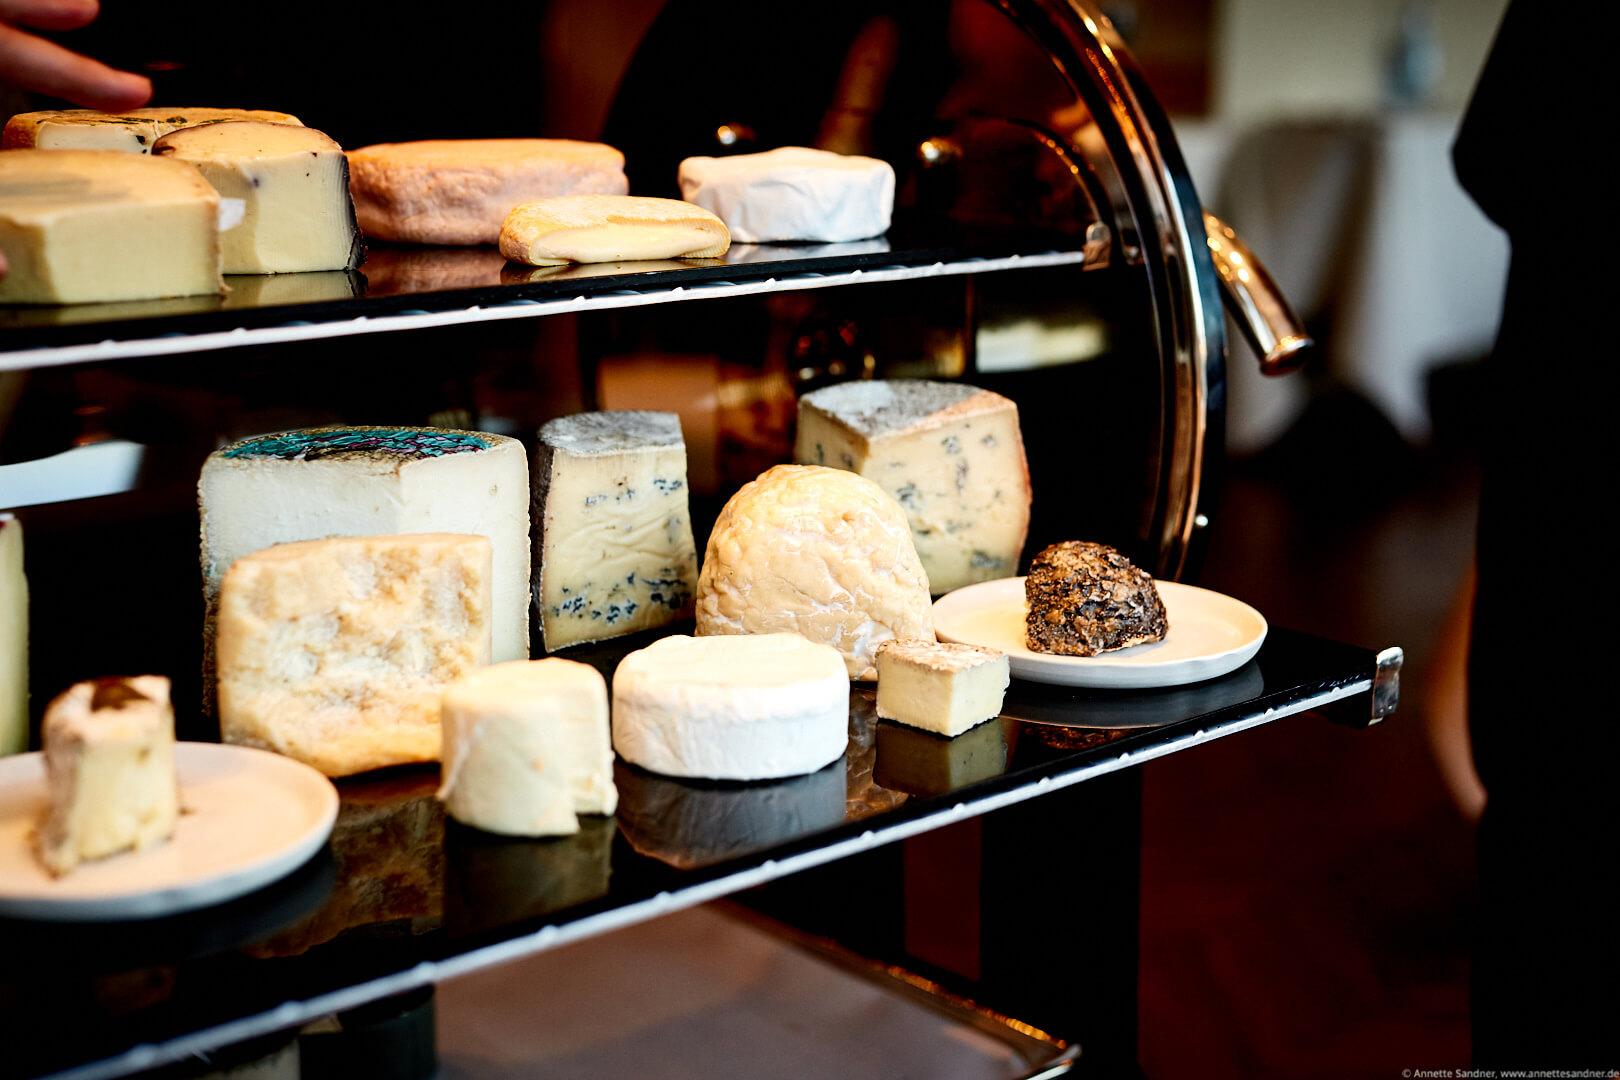 Käse aus dem Jumiversum Kuh, Schaf, Ziege, Gourmet Restaurant Olivo, Stuttgart